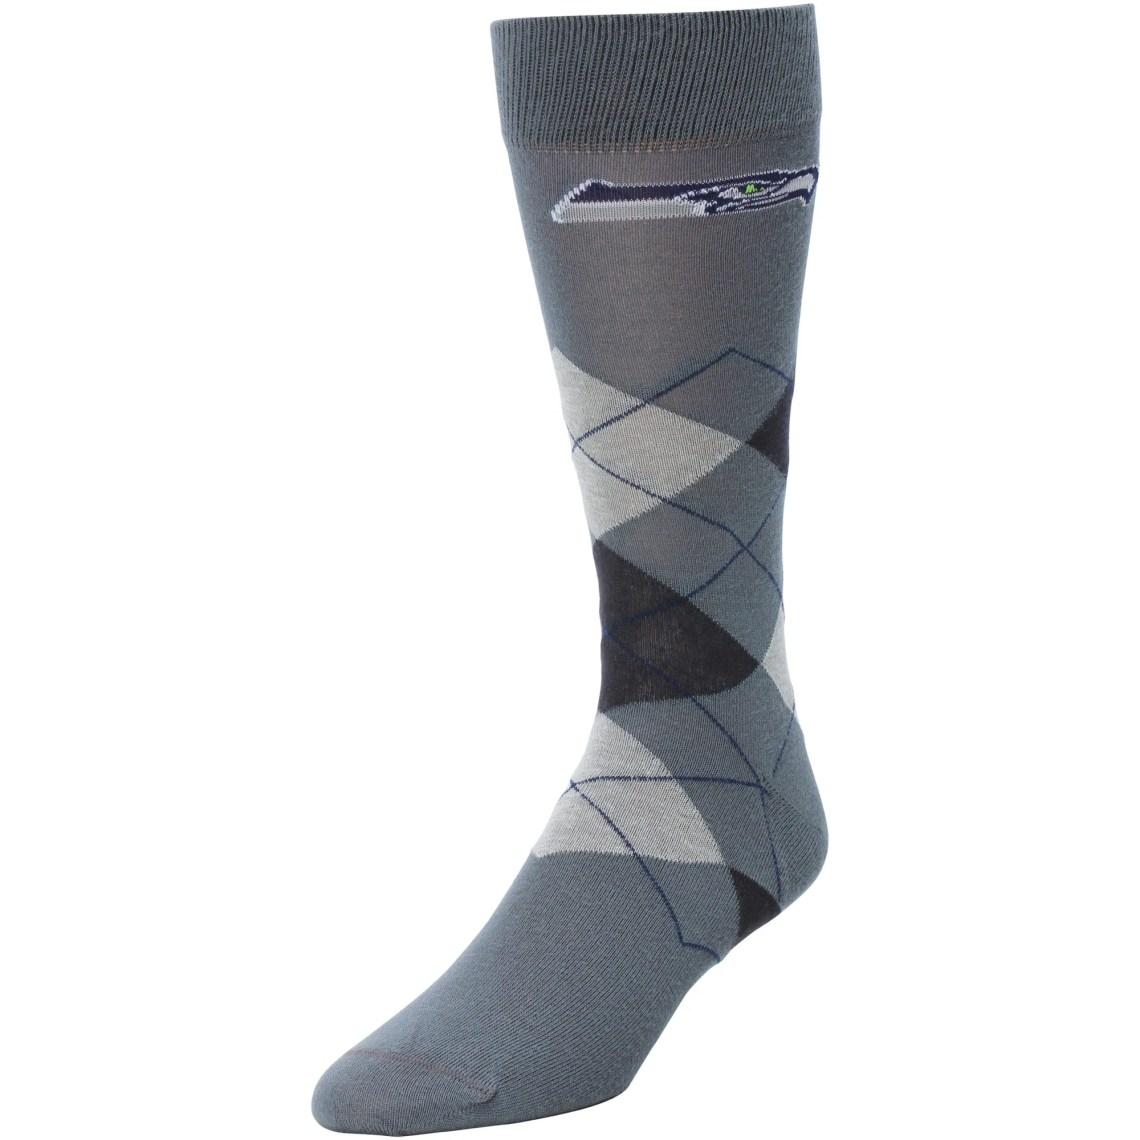 Seattle Seahawks Argyle Tube Socks